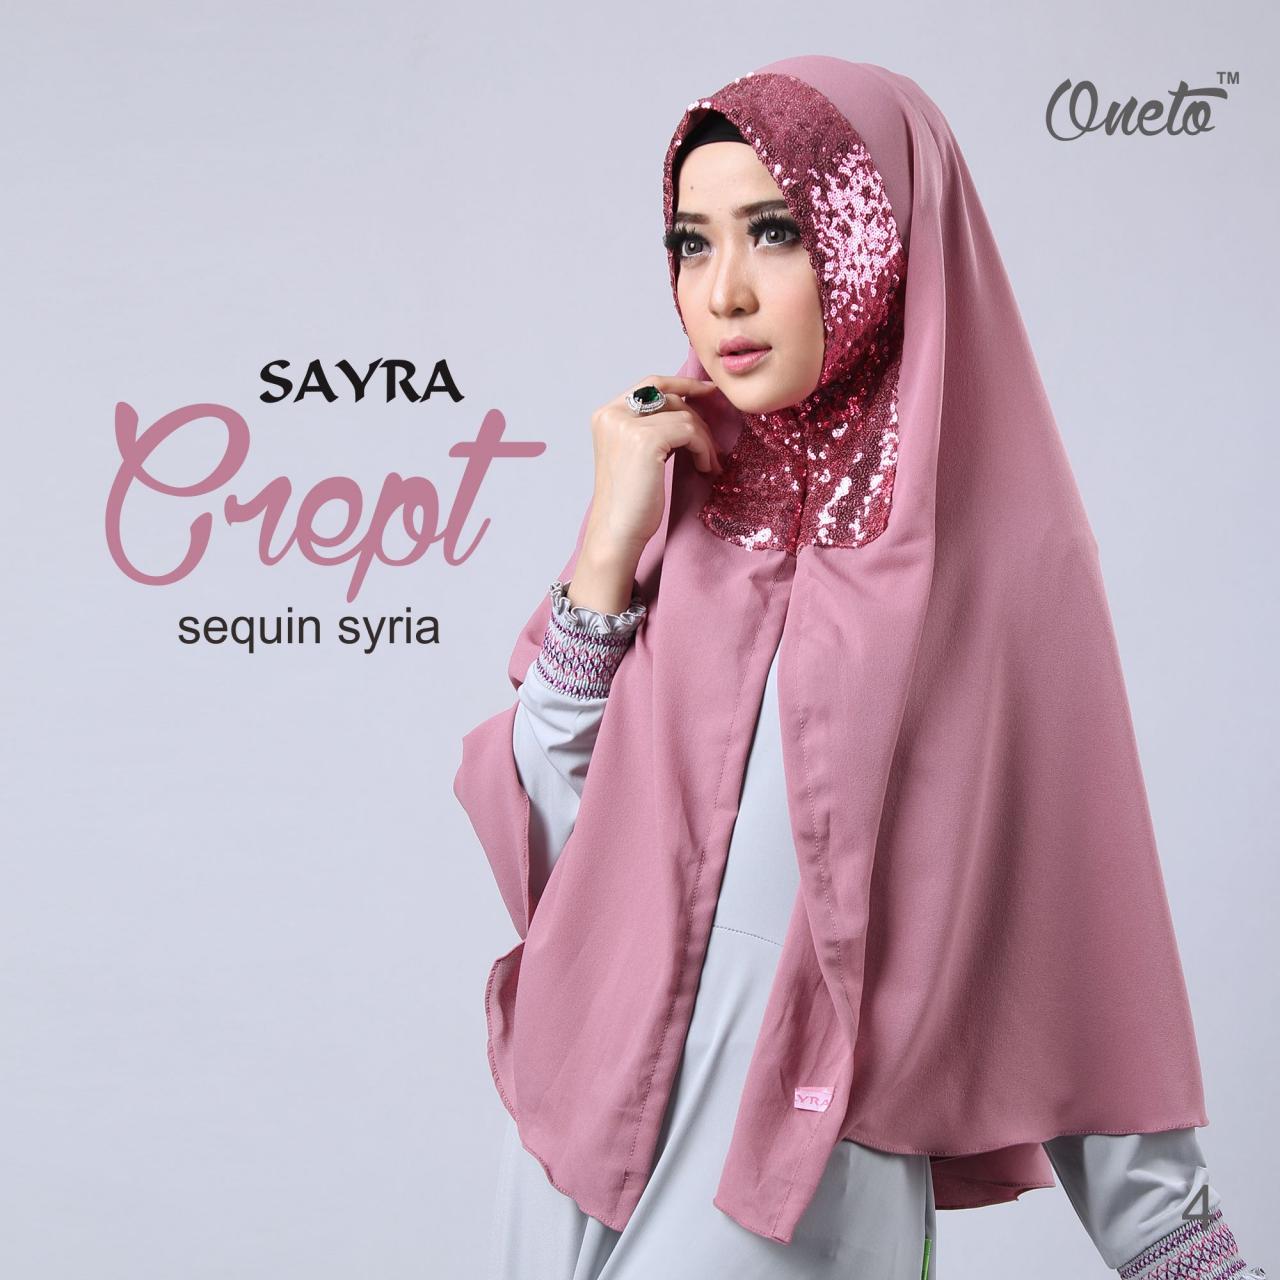 Khimar Instan Aisyah Pet Pink Pad Hijab Jilbab Serut Jual Kerudung Rubiah Bergo Kcb Di Lapak Adit Official